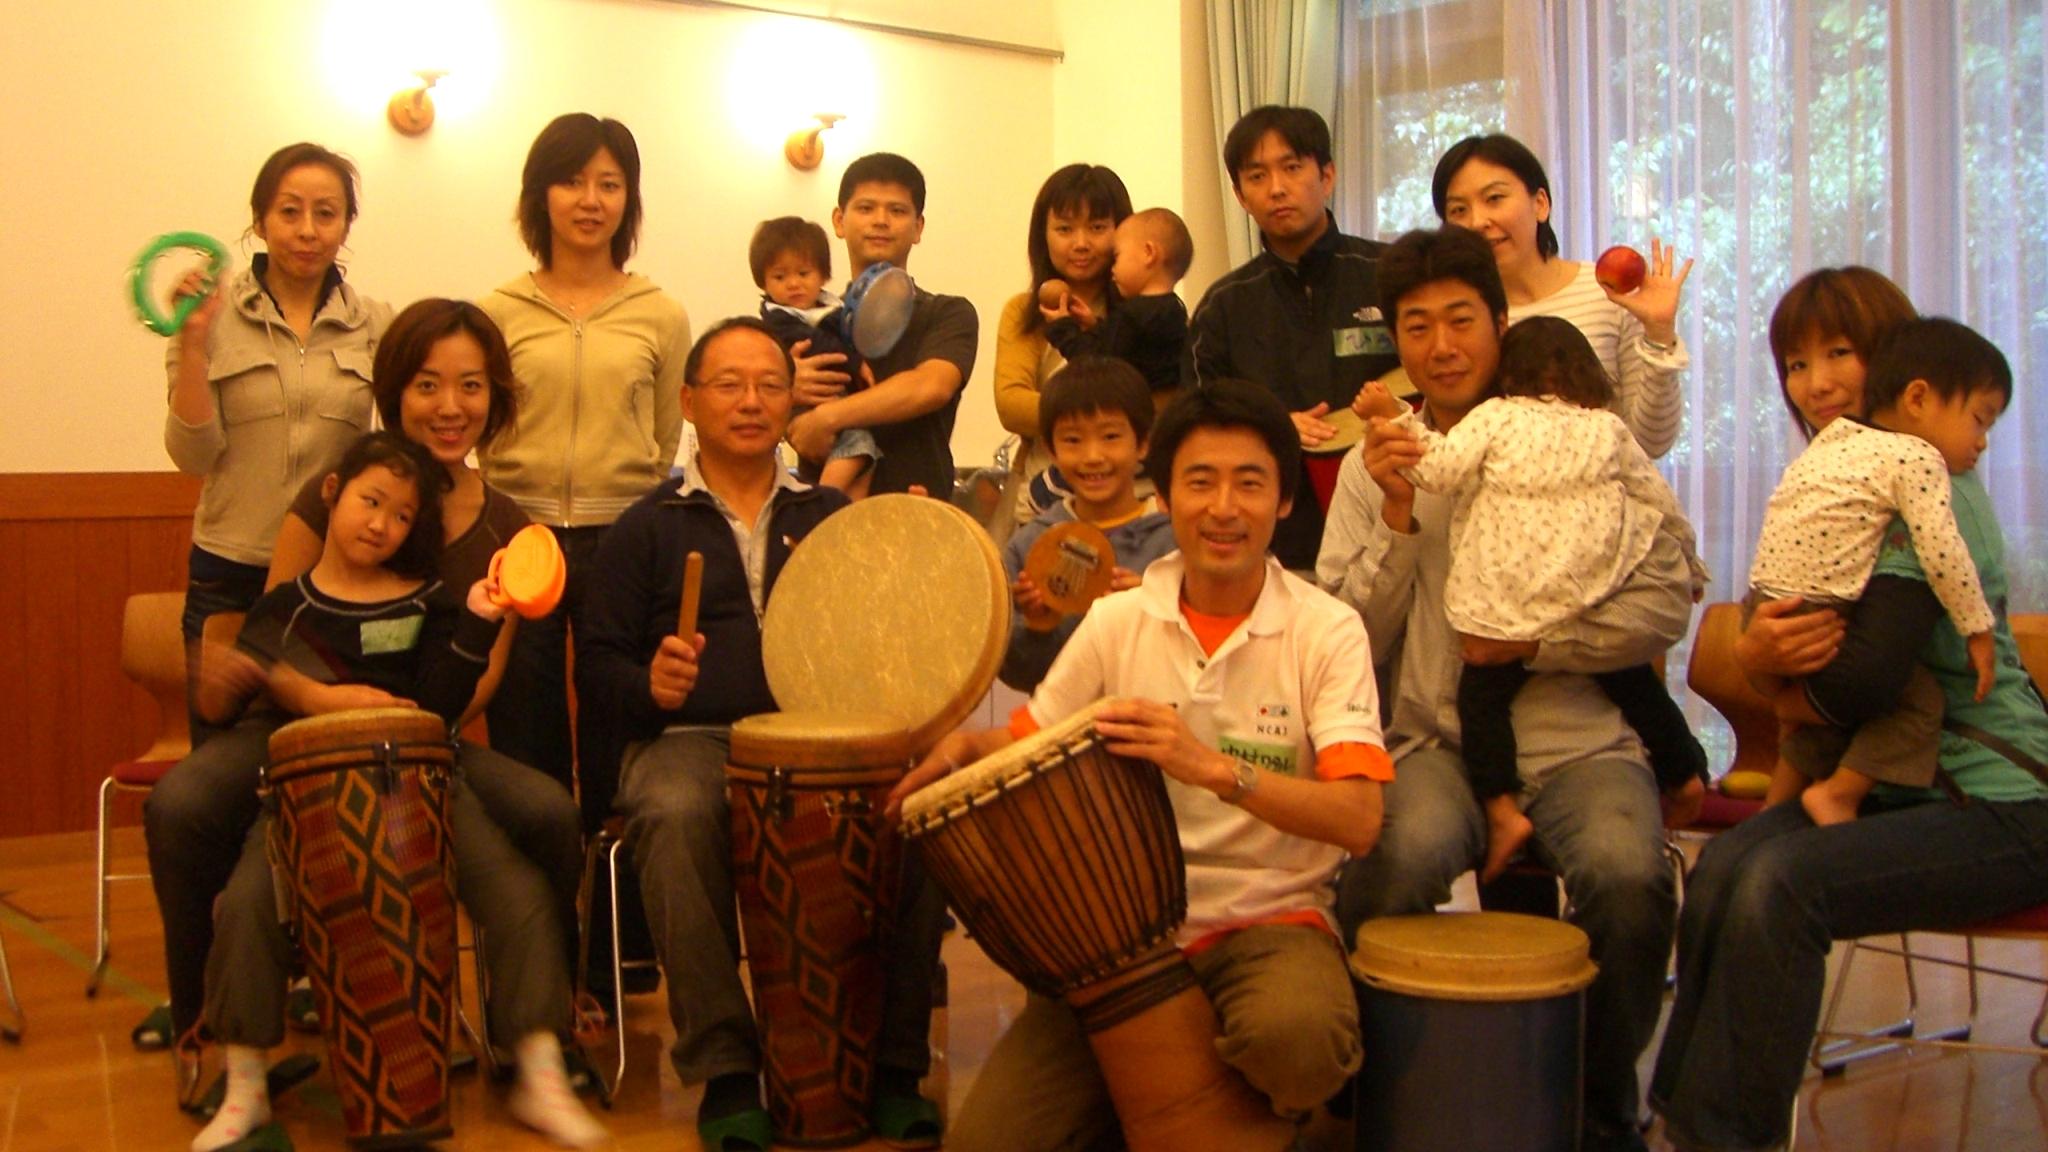 【Woodsキャンプ】朝霧高原で親子向けドラムサークル!